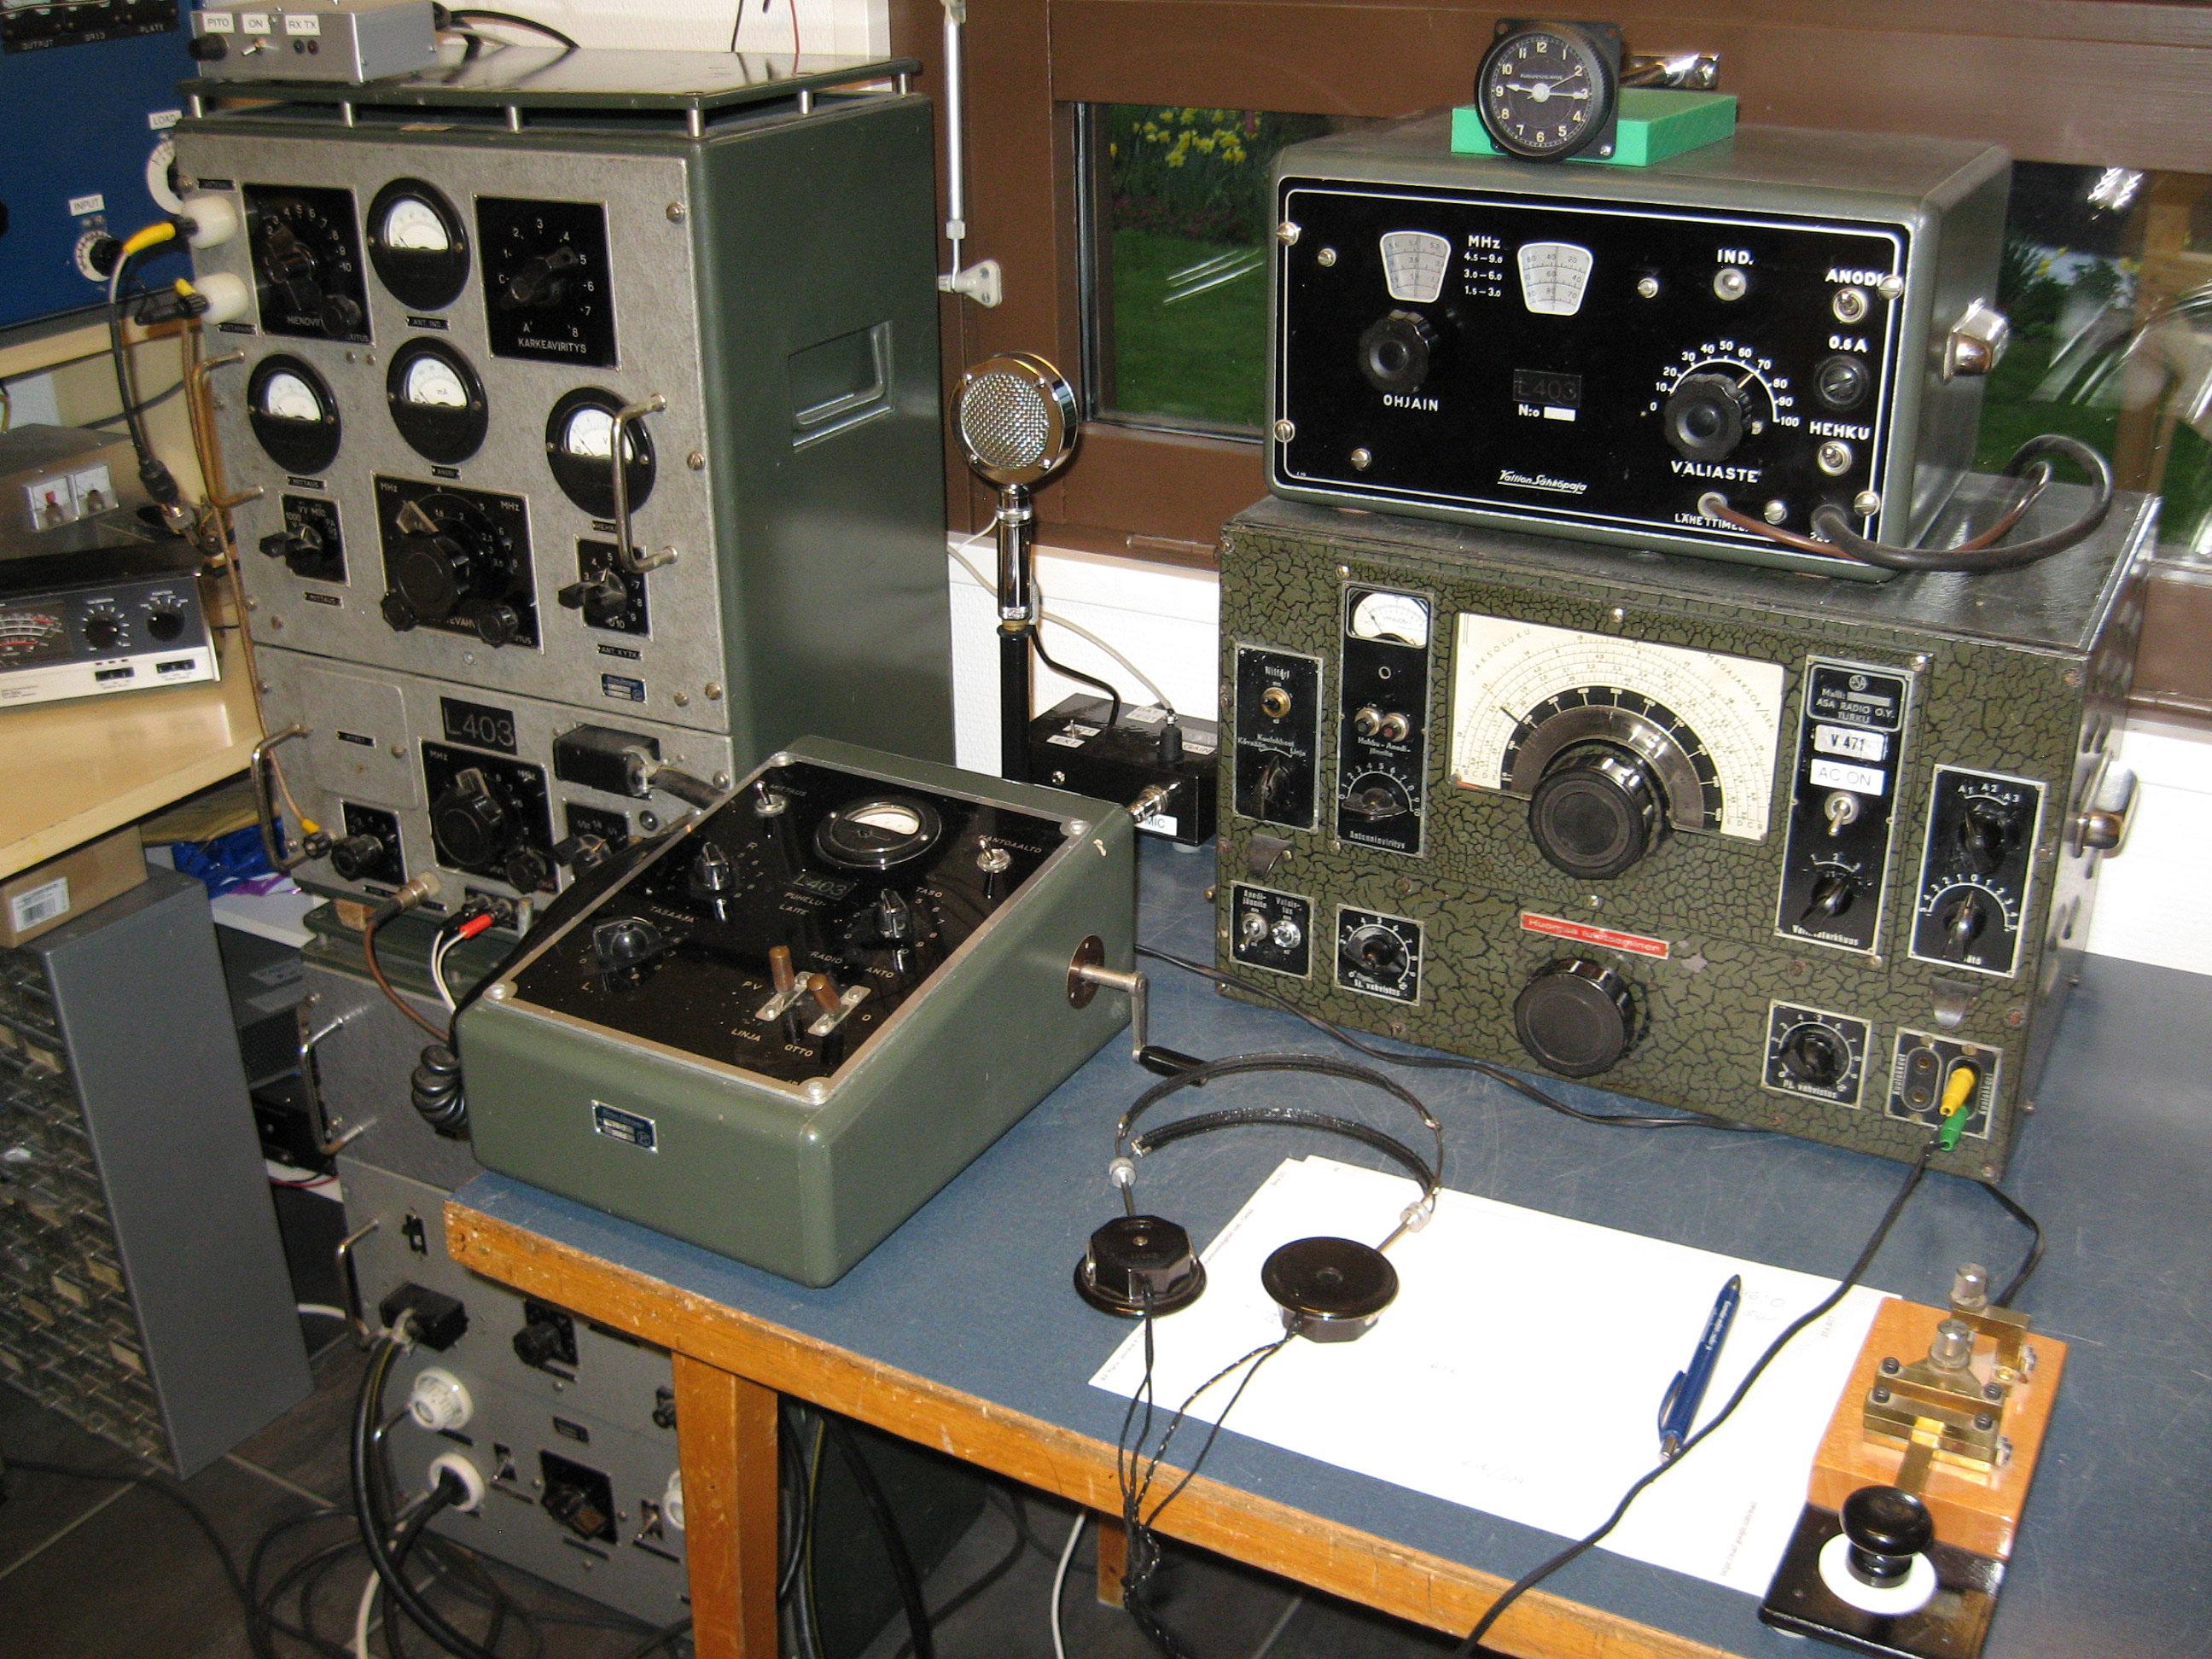 Vanhoja radioita.